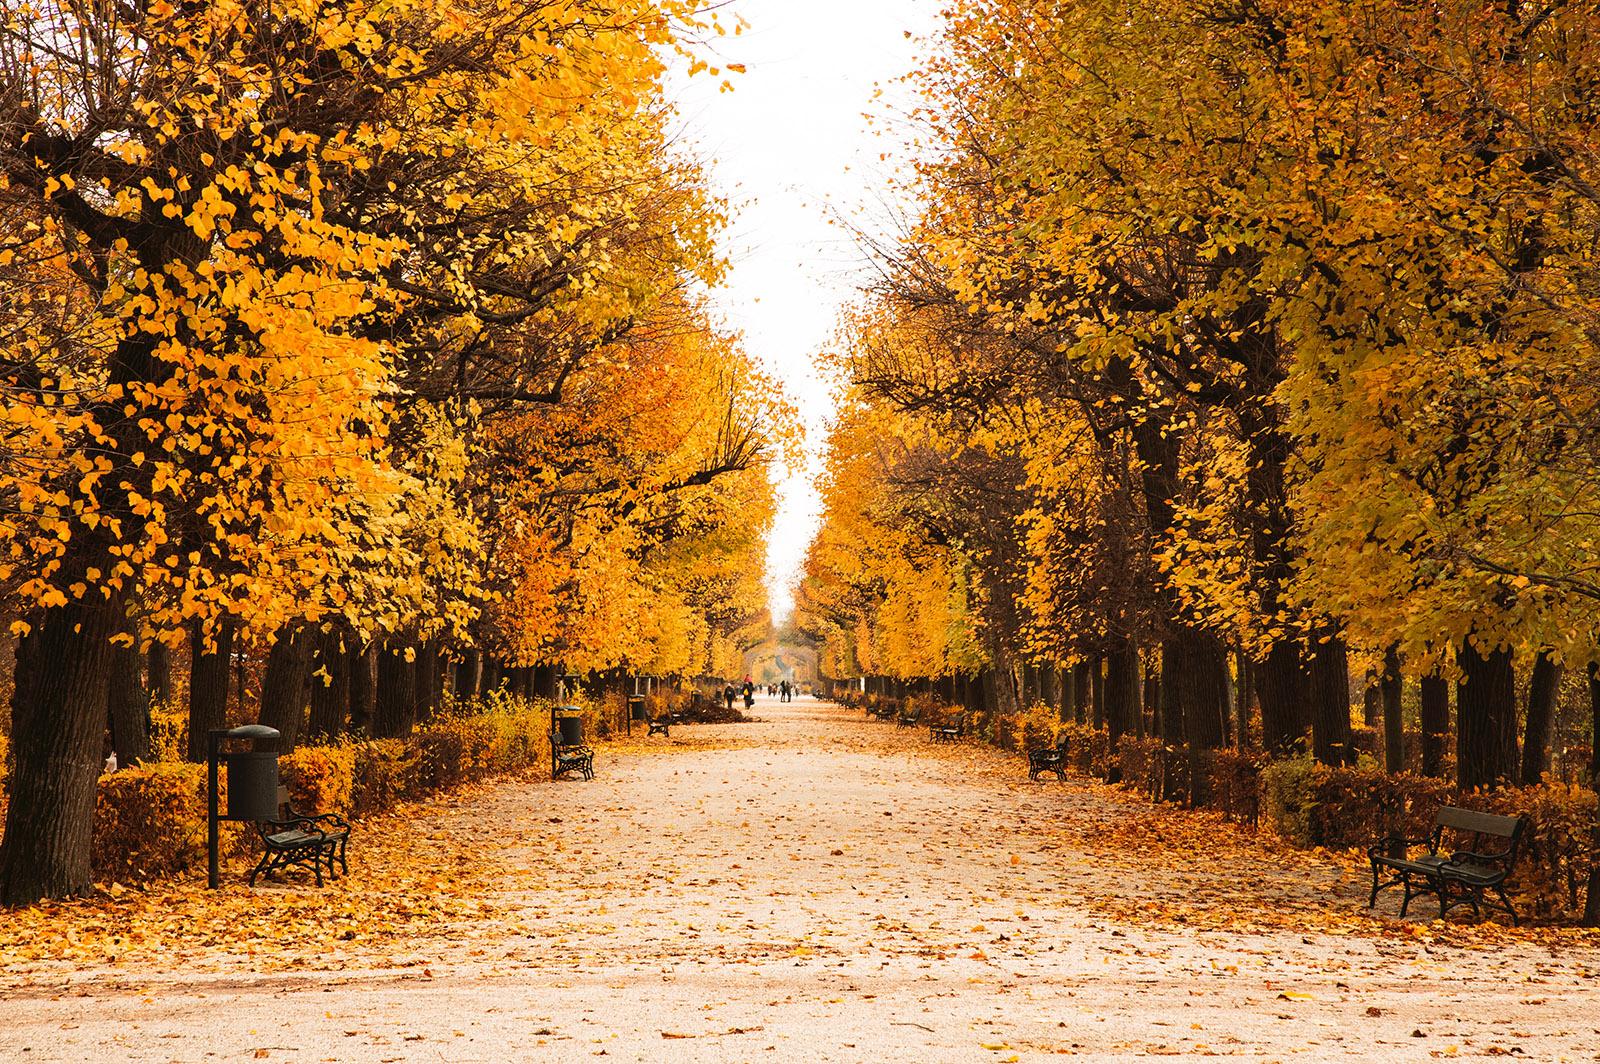 autumn leaves in a park in vienna, austria